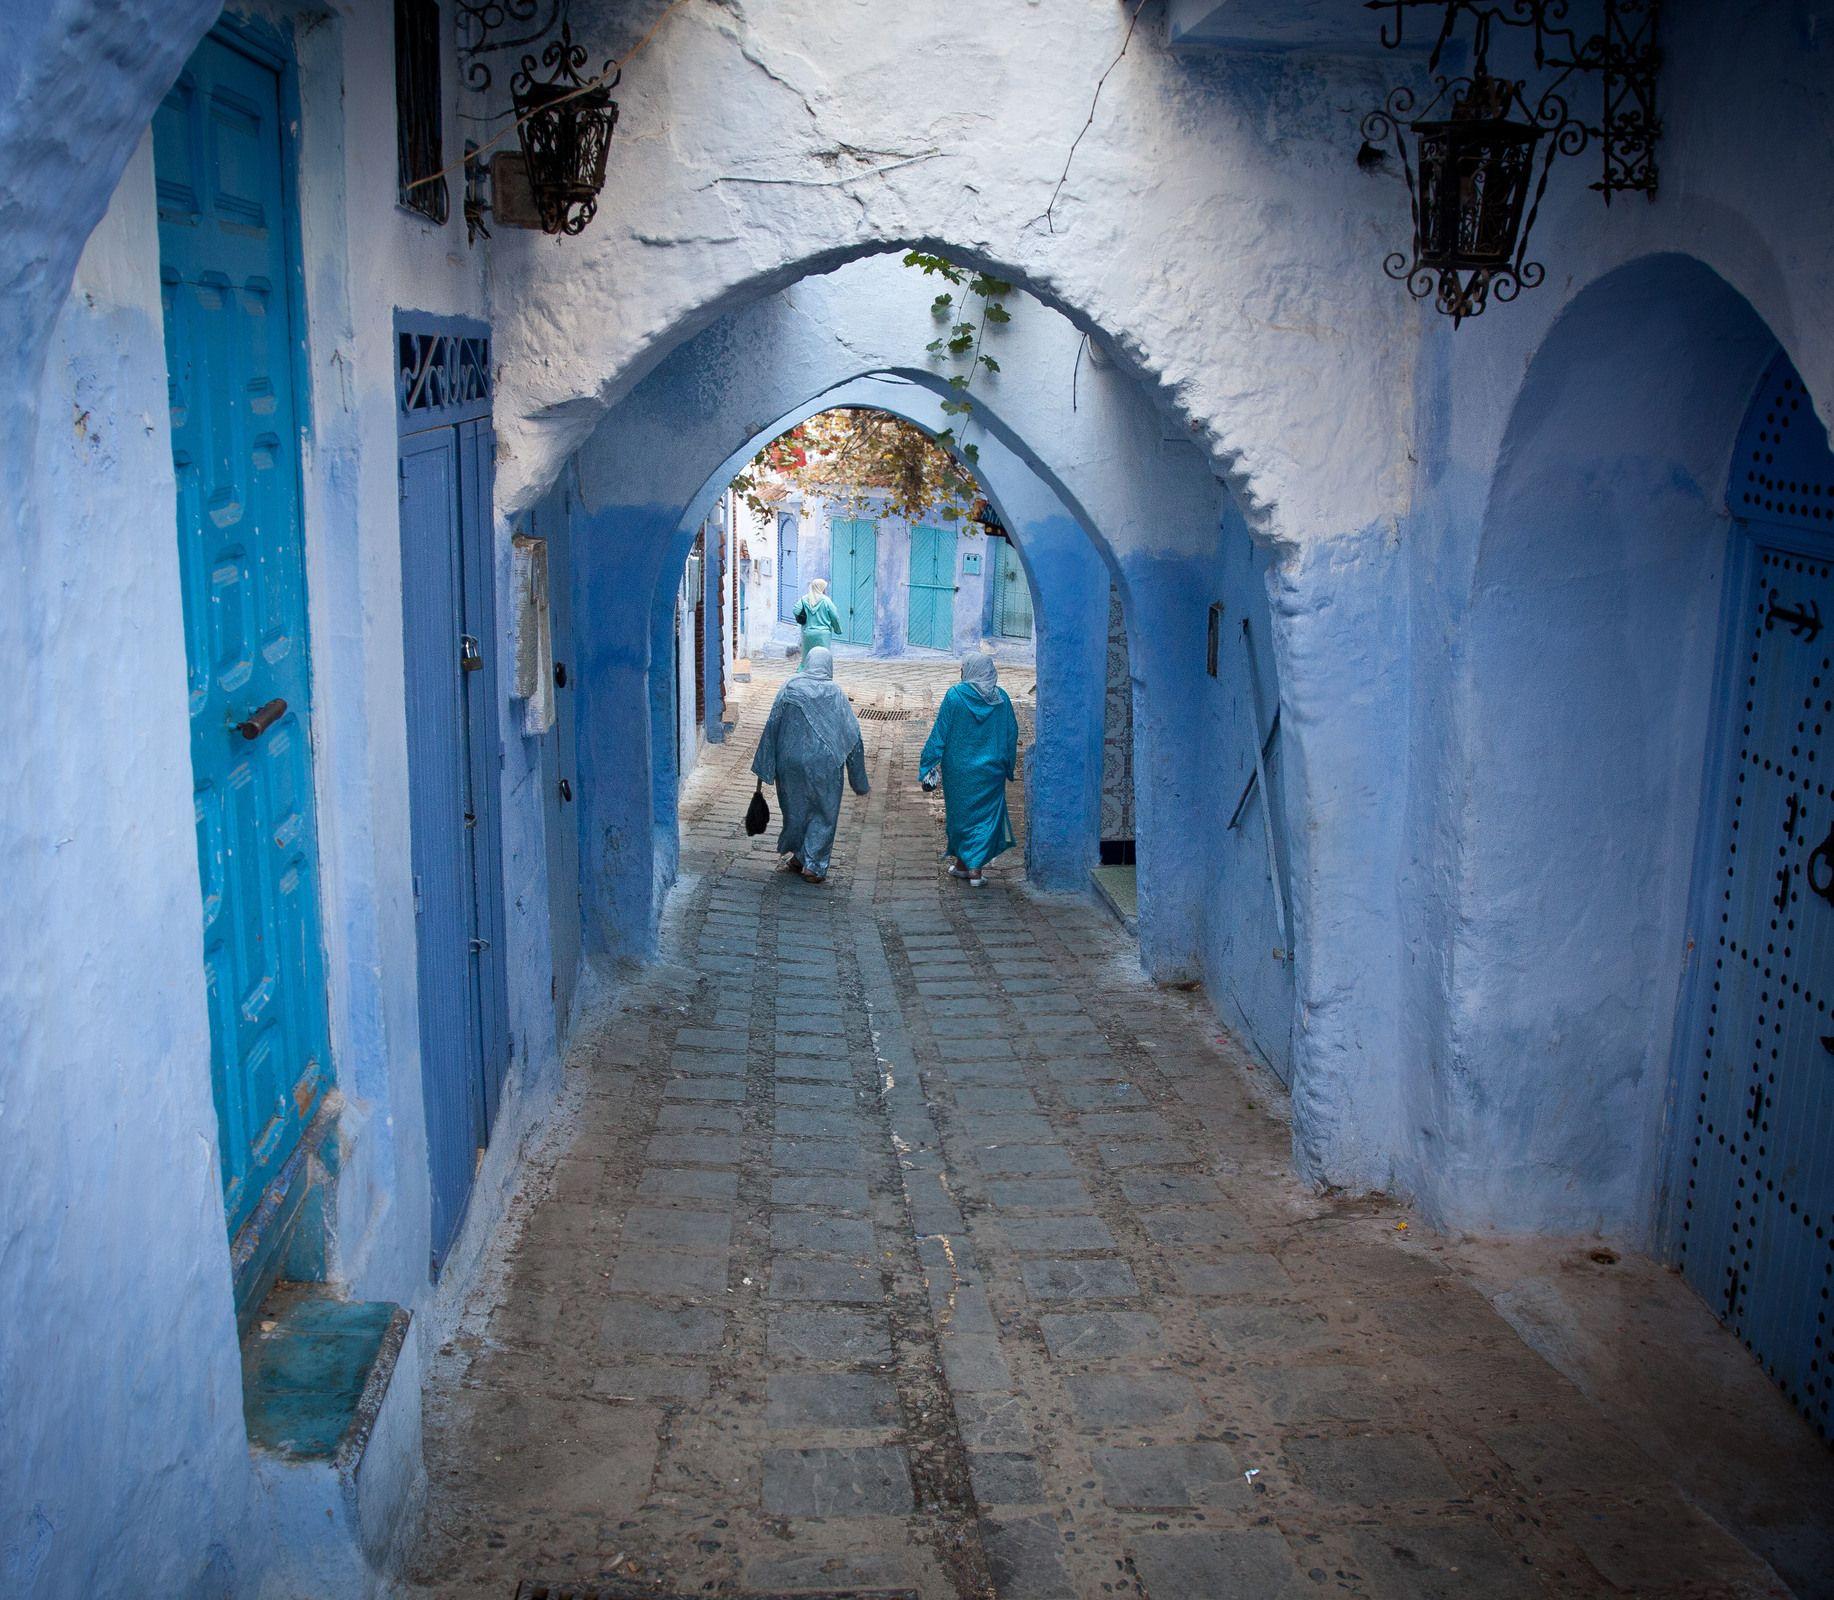 Morocco on Fotopedia